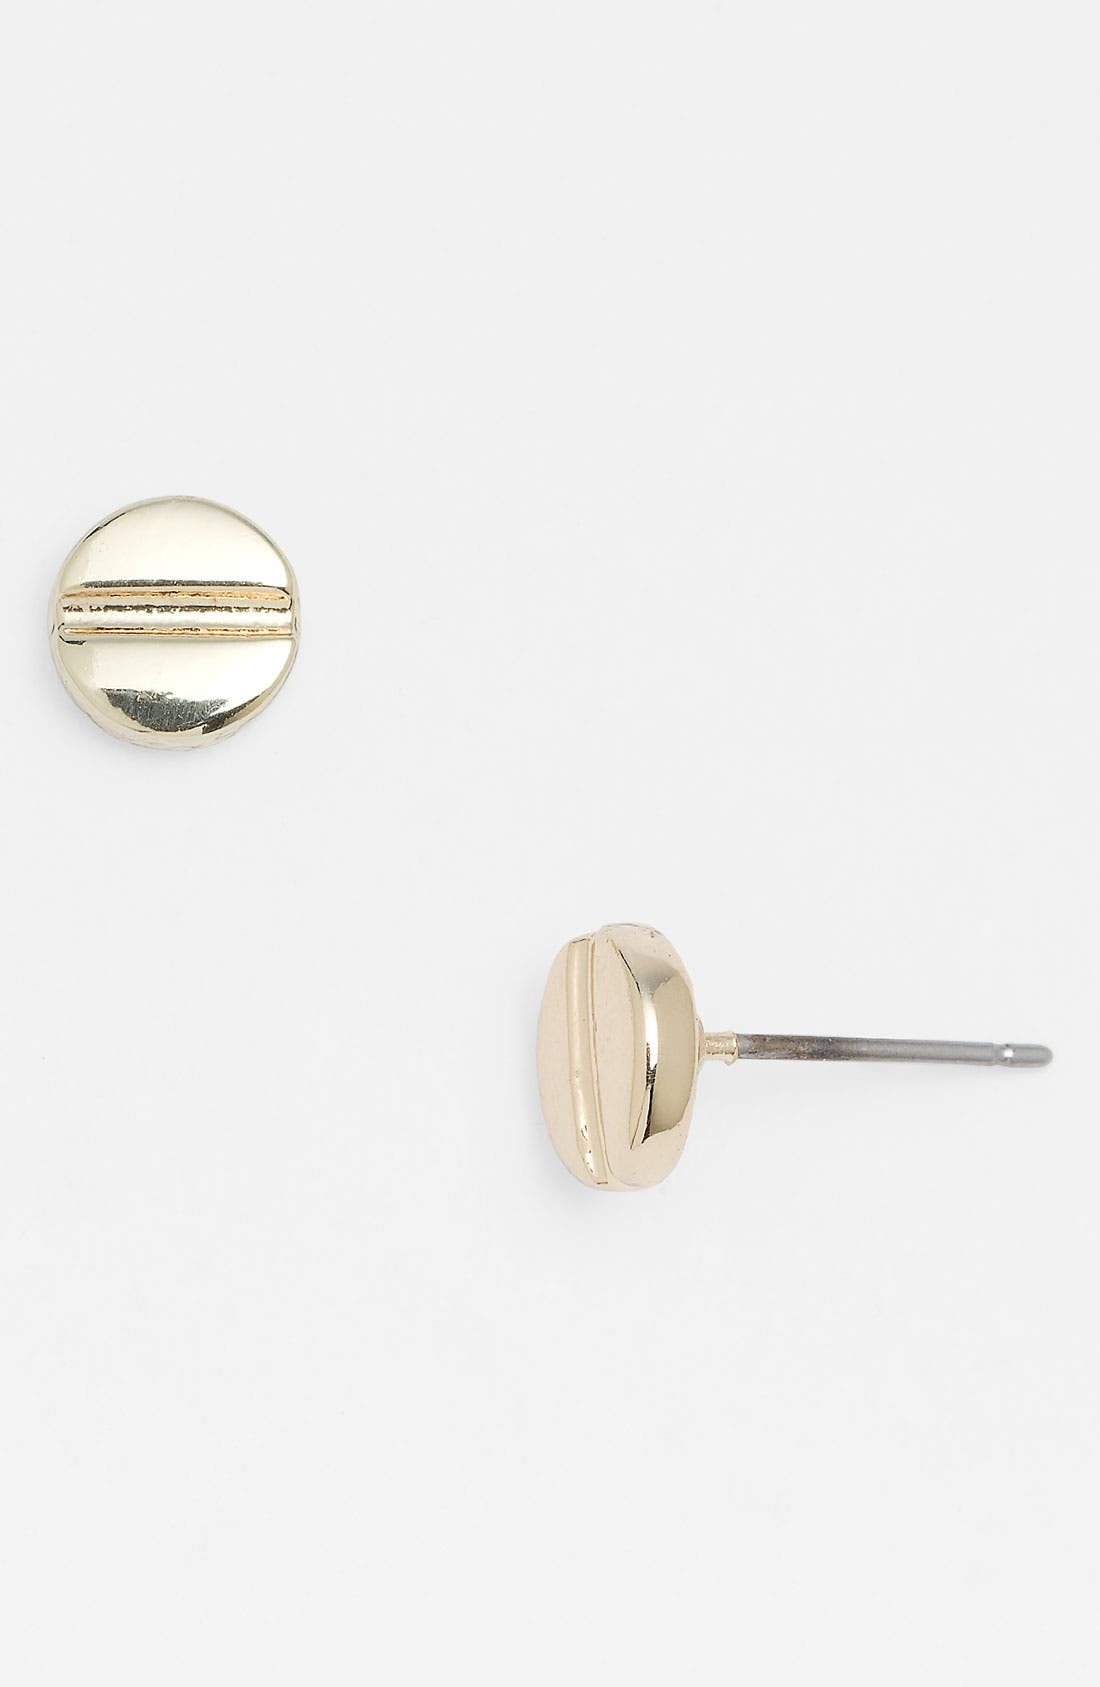 Main Image - Vince Camuto 'Basics' Stud Earrings